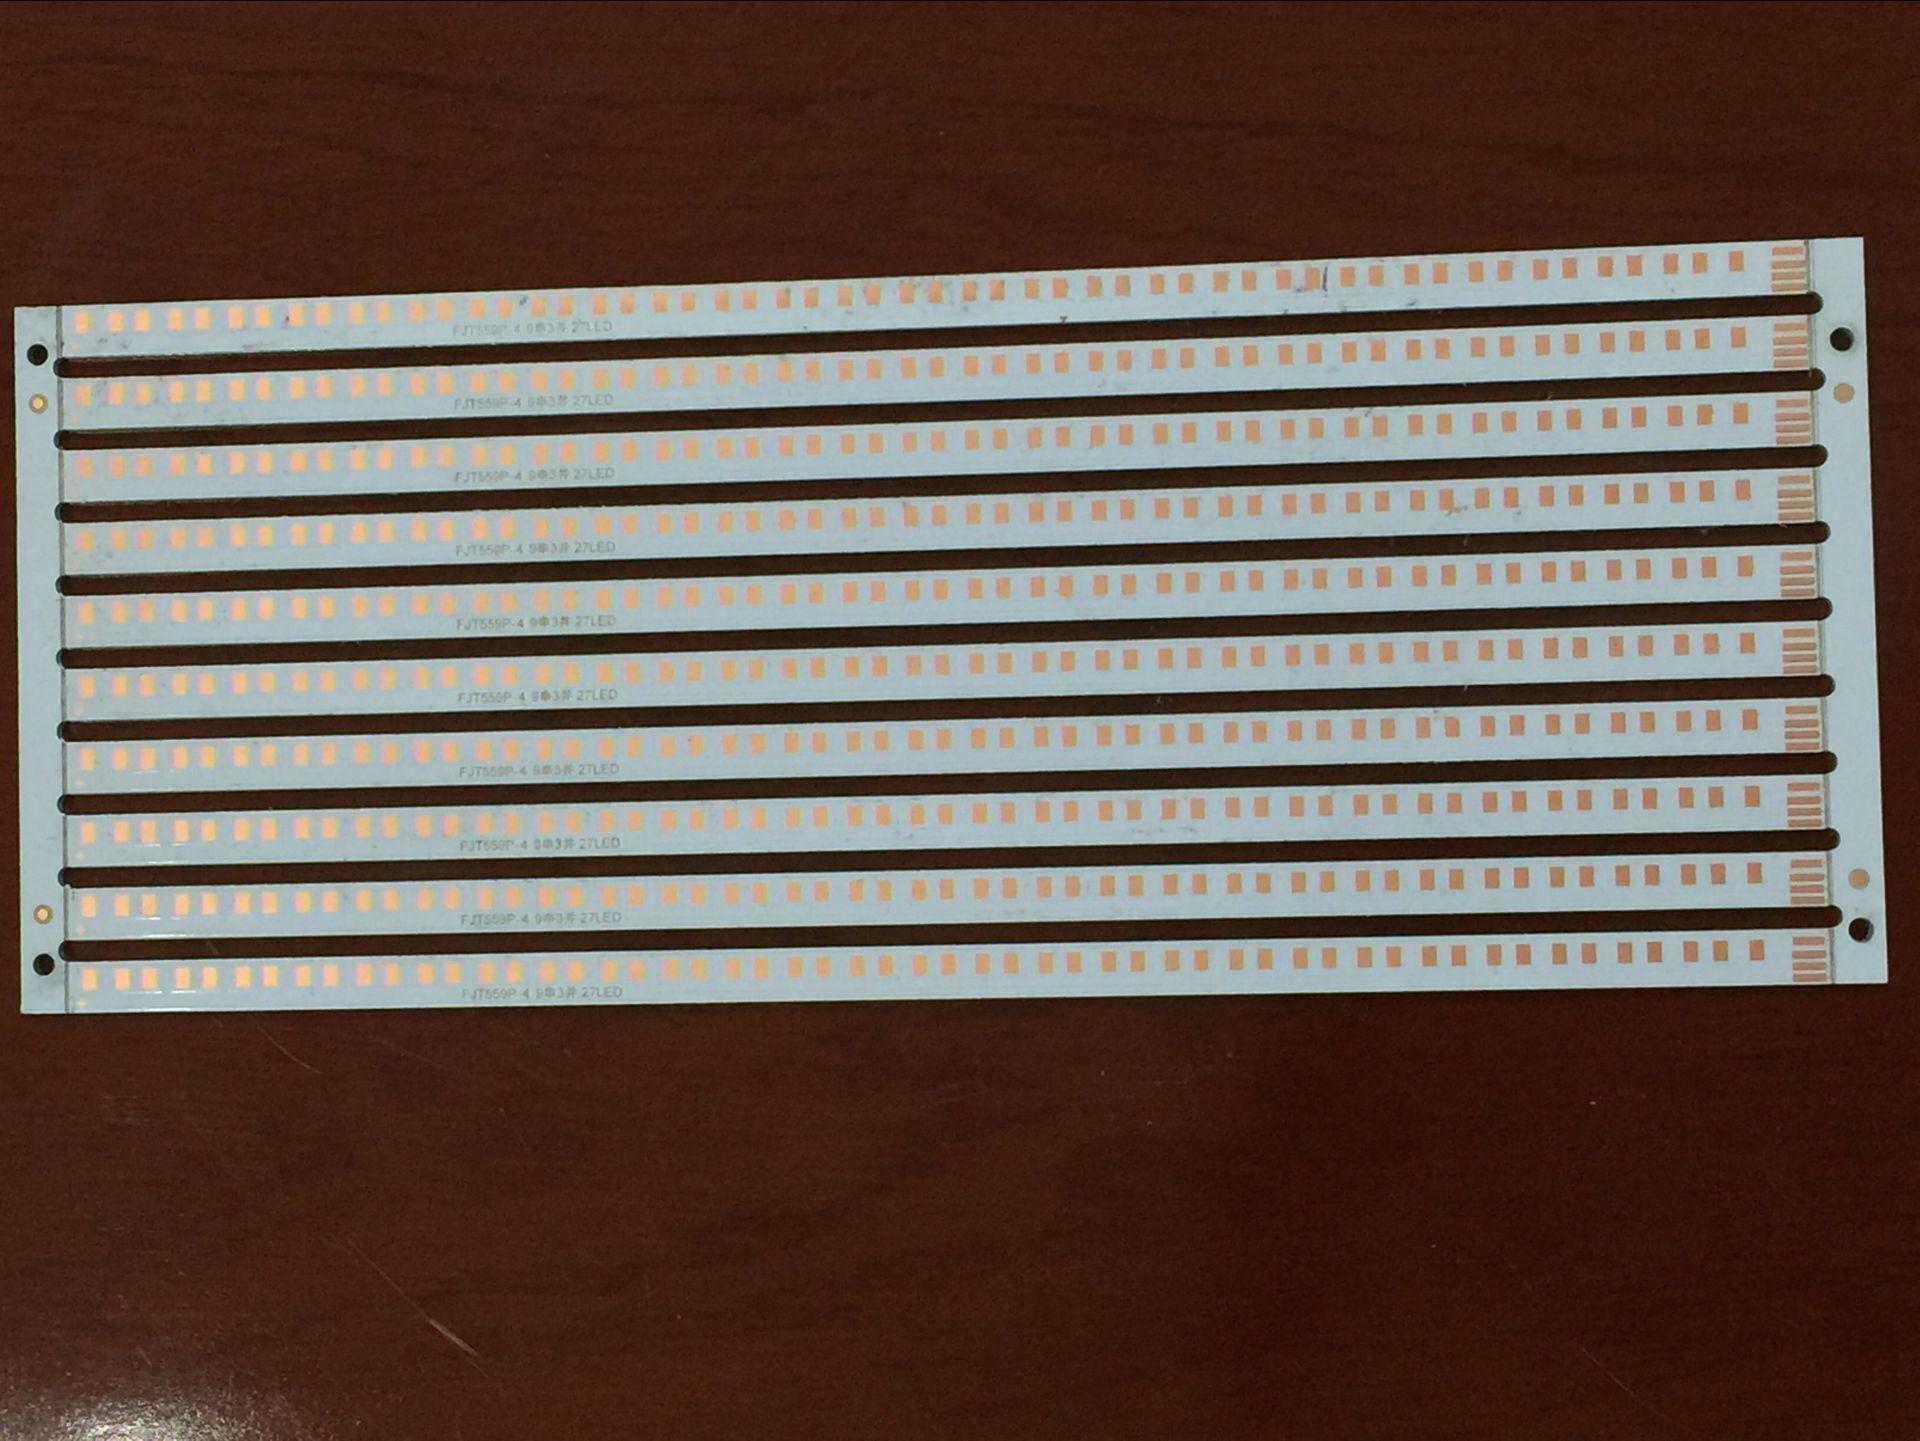 High Power Led Panel Pcb Circuit Board Manufacturing China Printed Assembly Ycpcba110045 Pcba